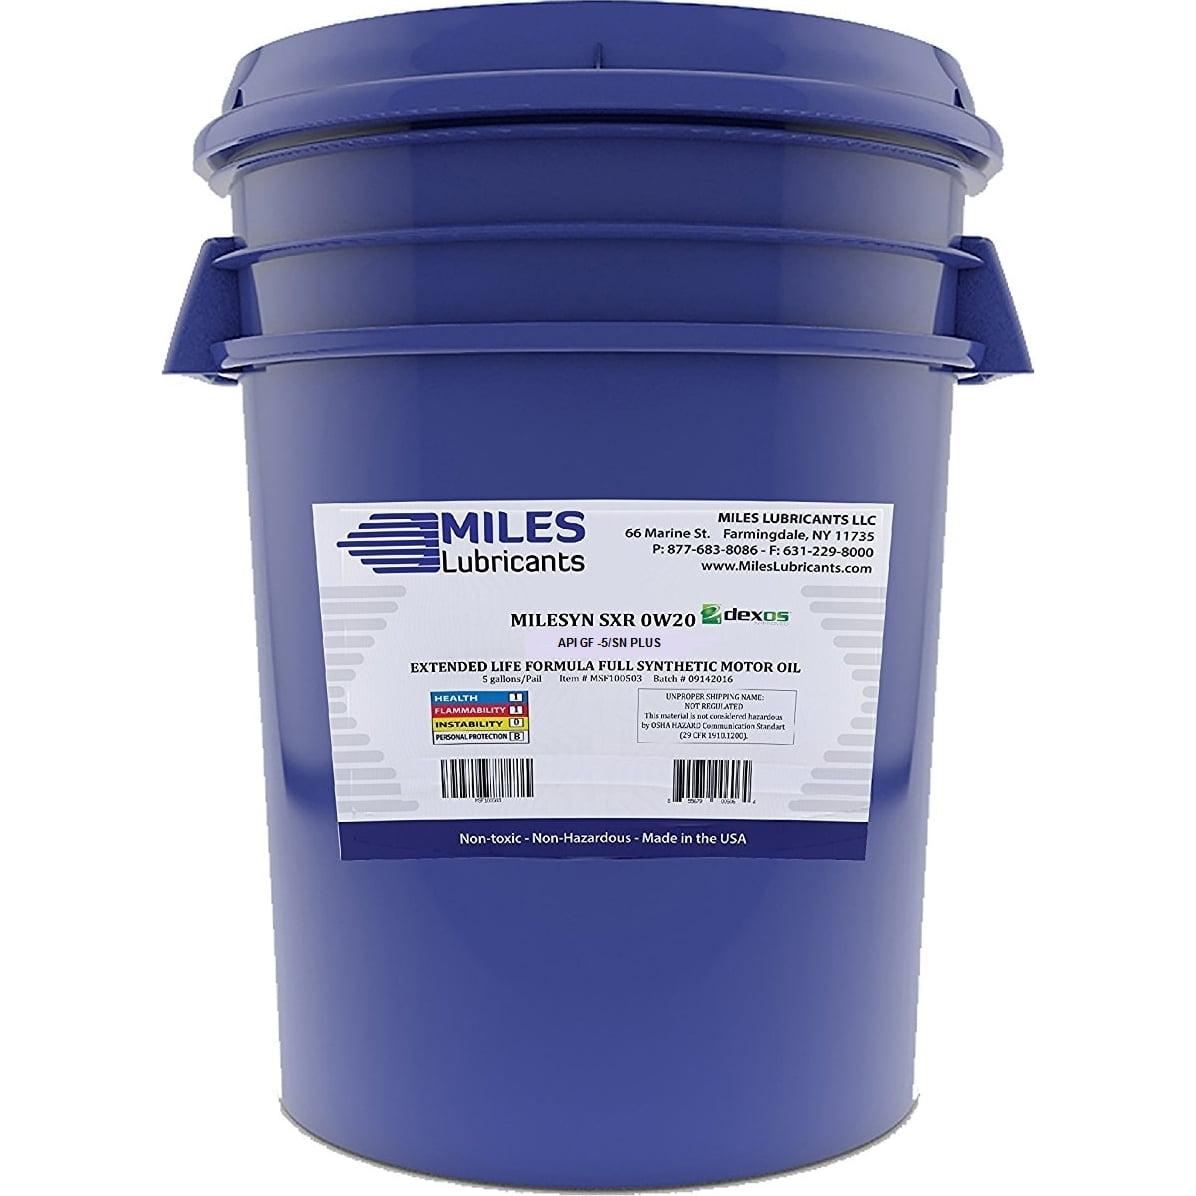 Milesyn SXR 0W20 API GF-5/SN, Dexos1, Full Synthetic Motor Oil, 5-Gallon Pail